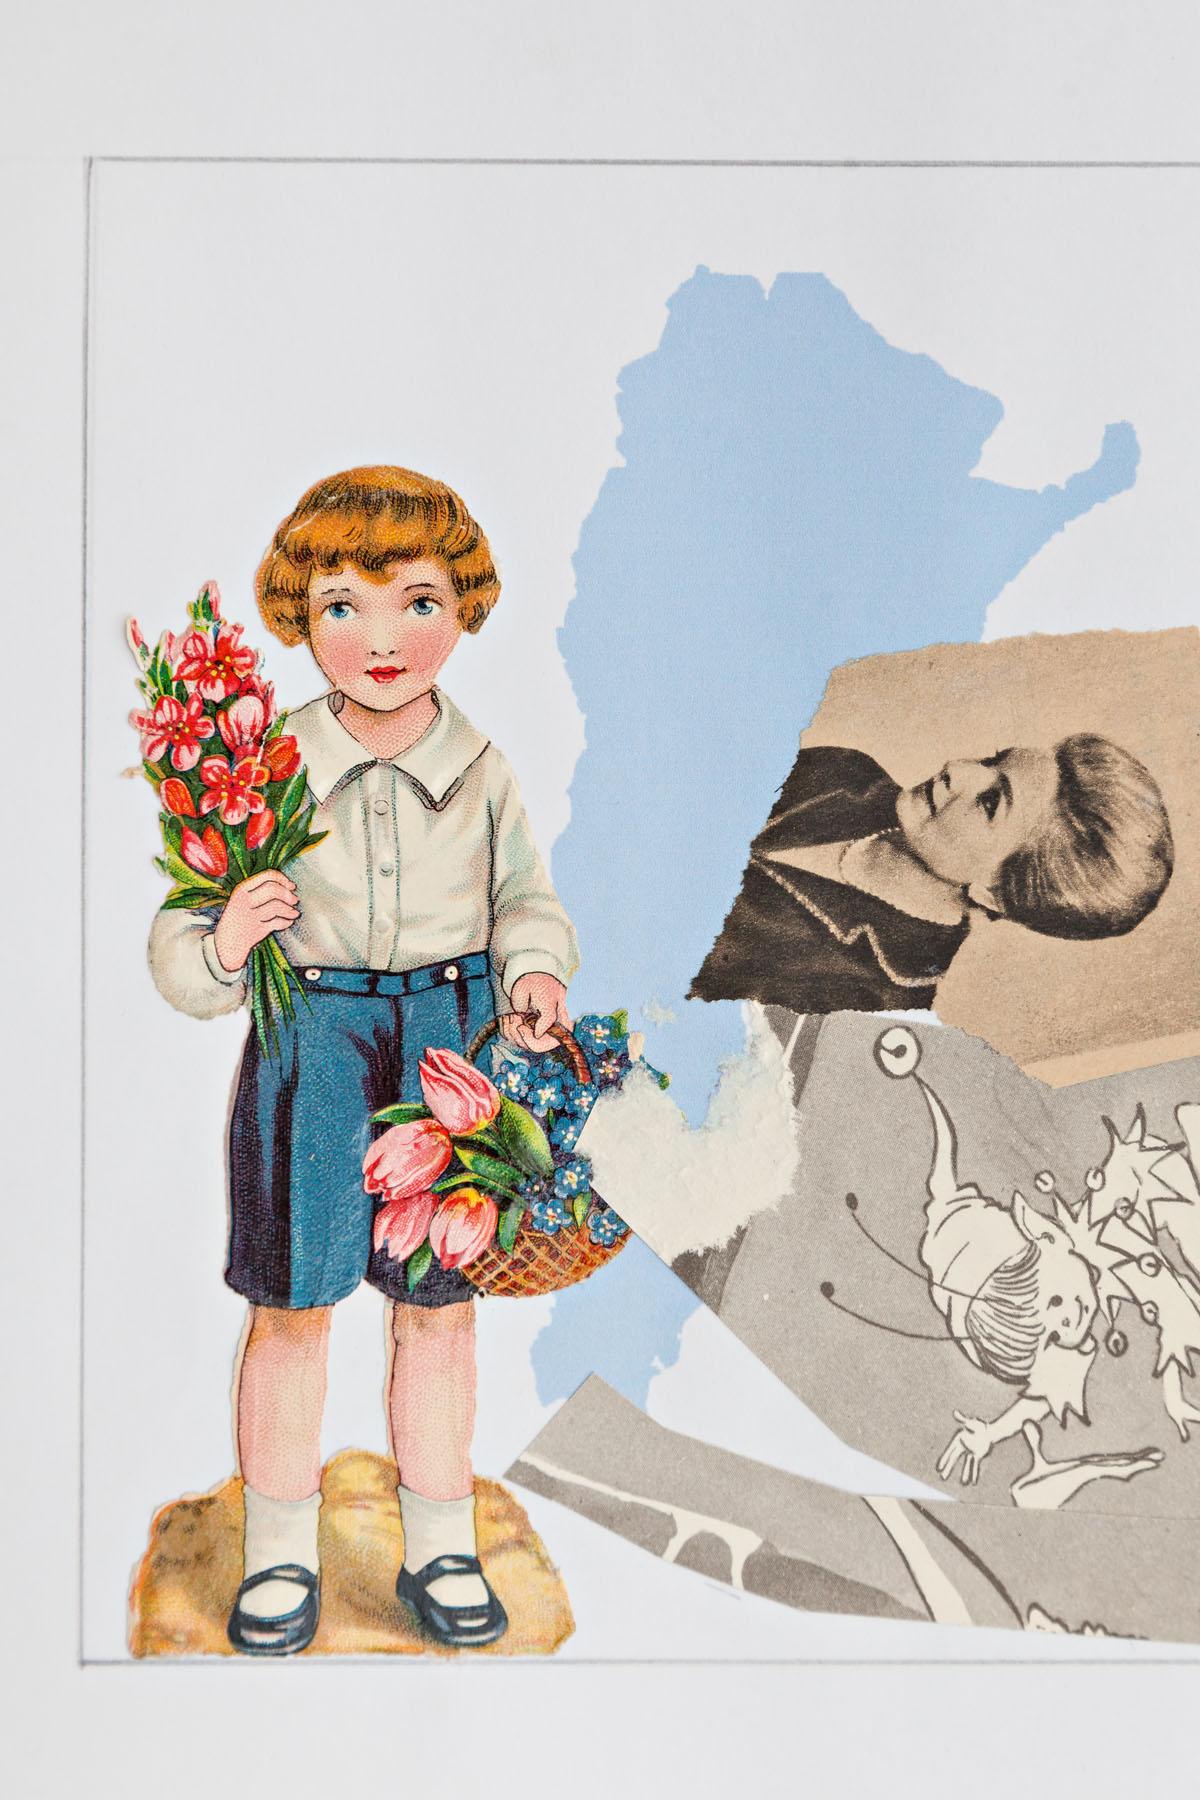 Serie verano, papel collage, 35,5 cm x 21,5 cm , 2020